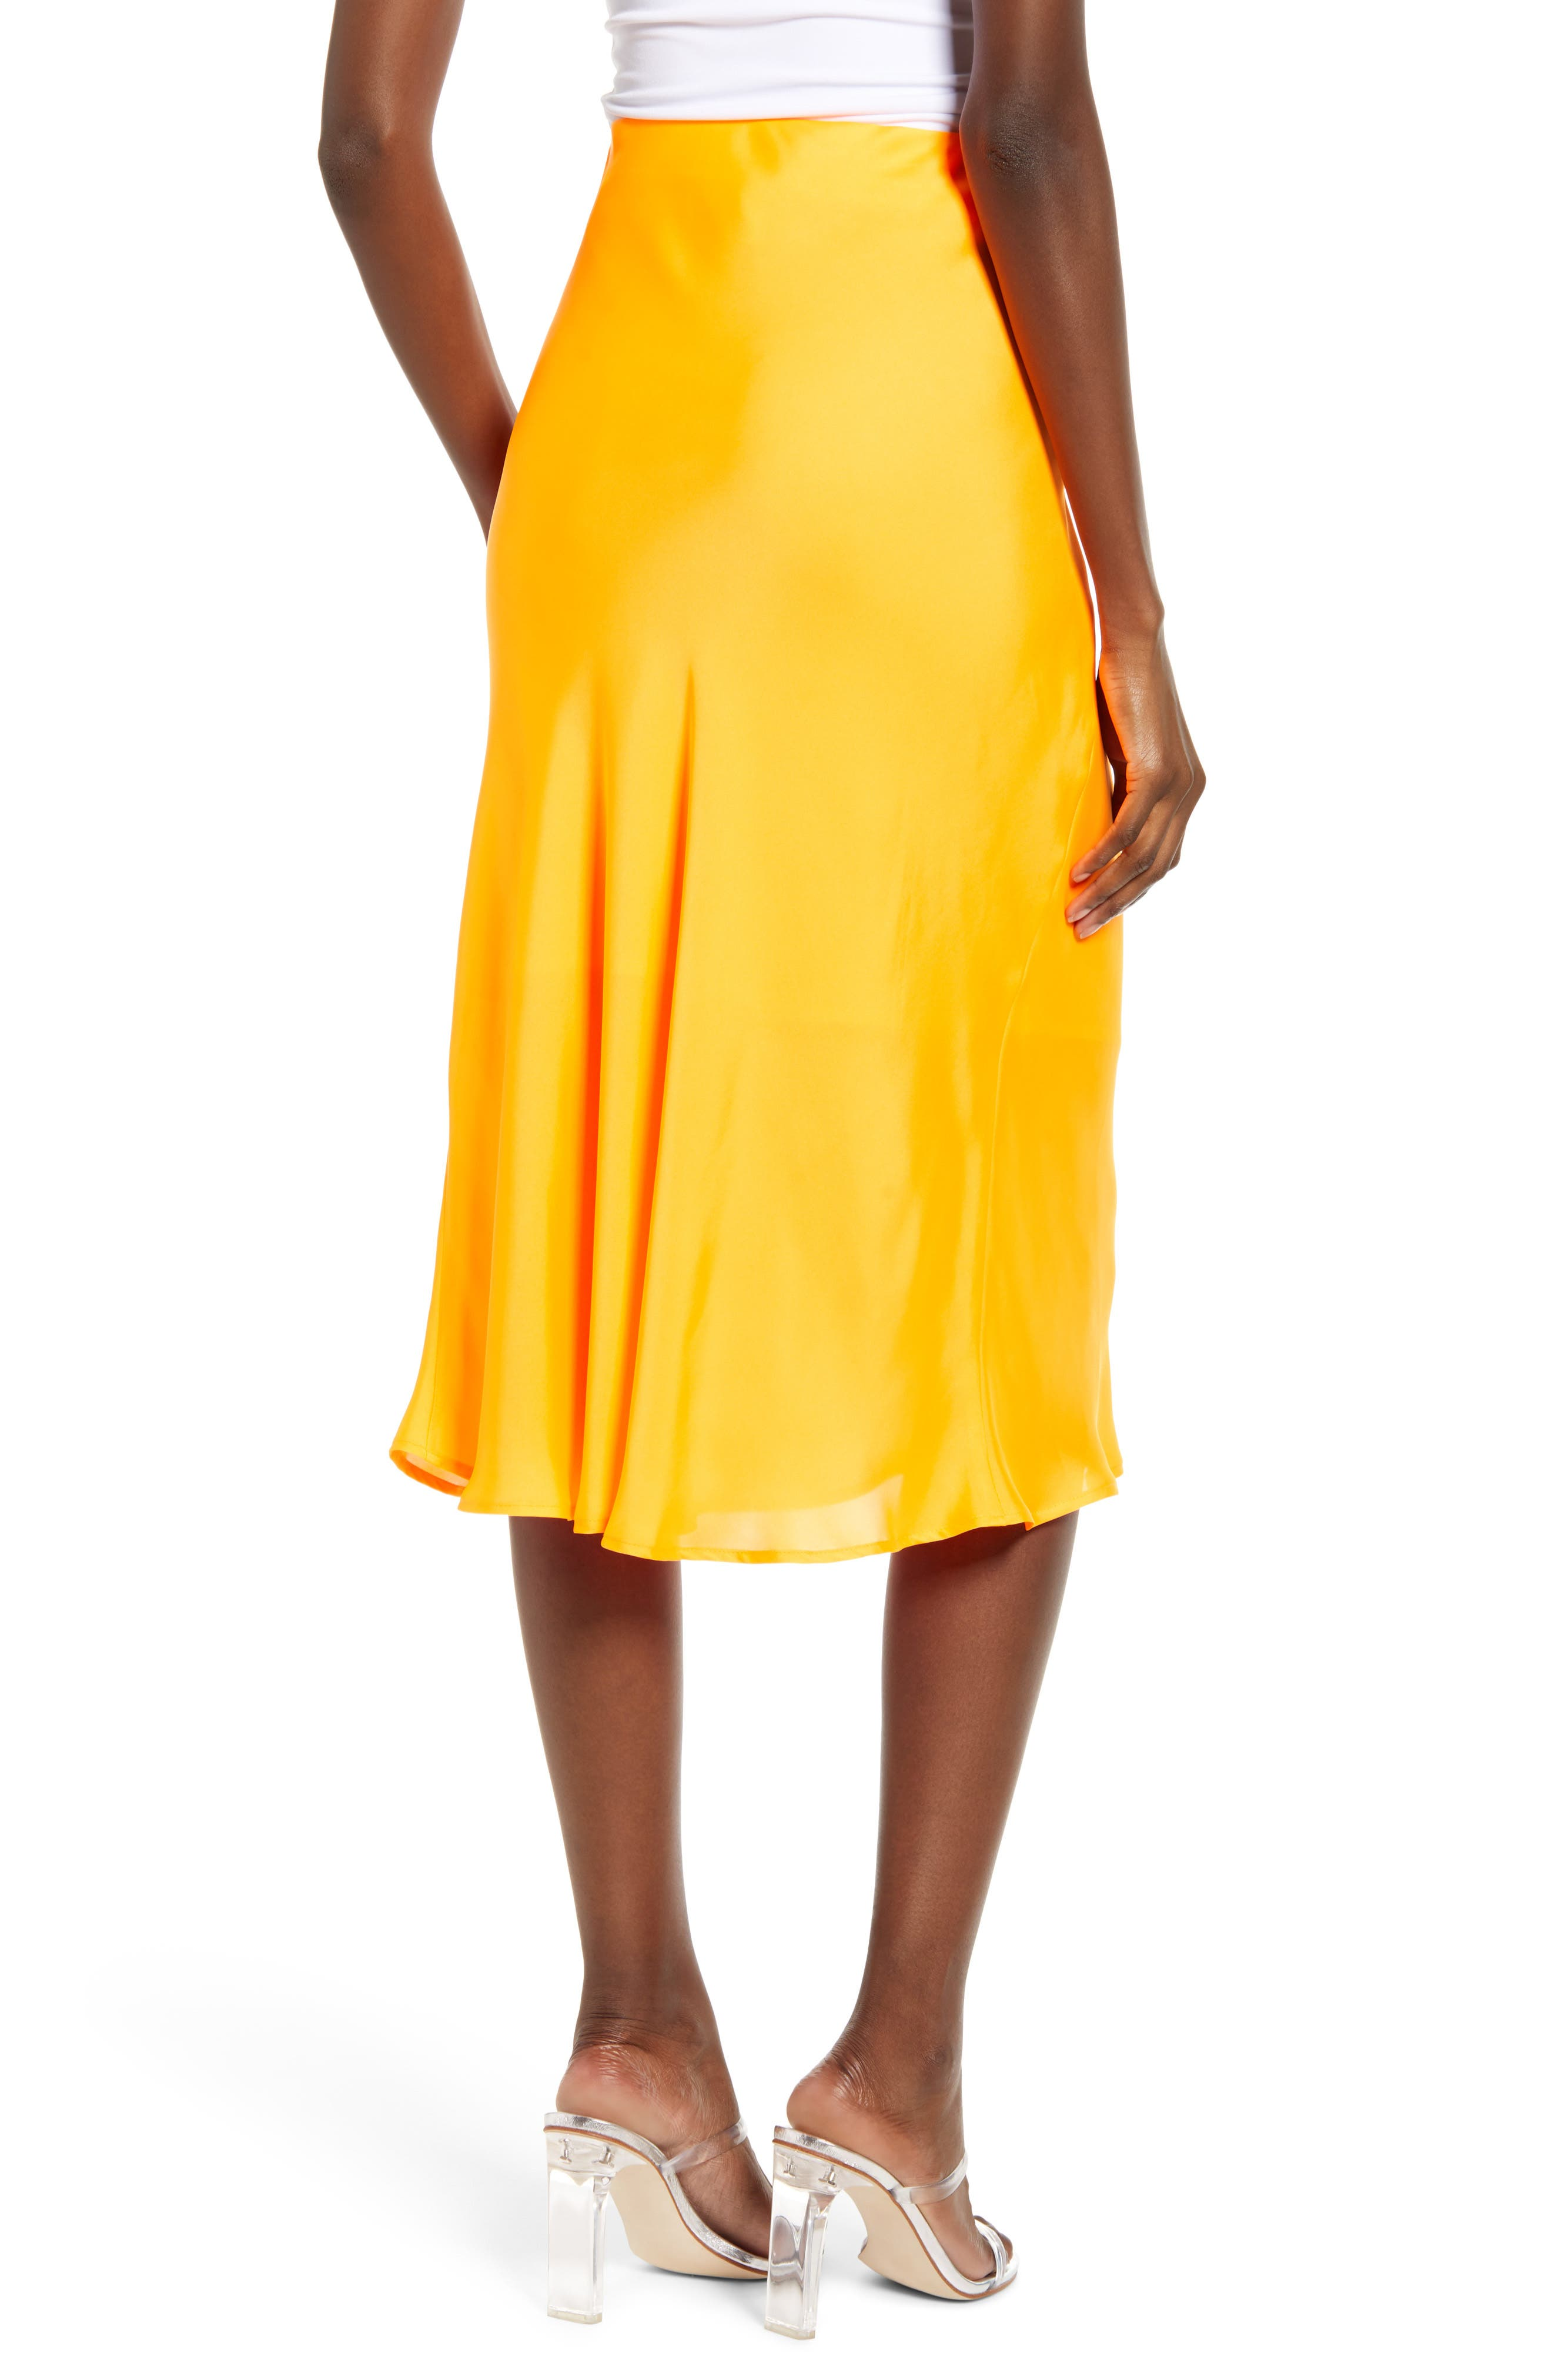 0b05f71b14 Women's Skirts Work Clothing | Nordstrom